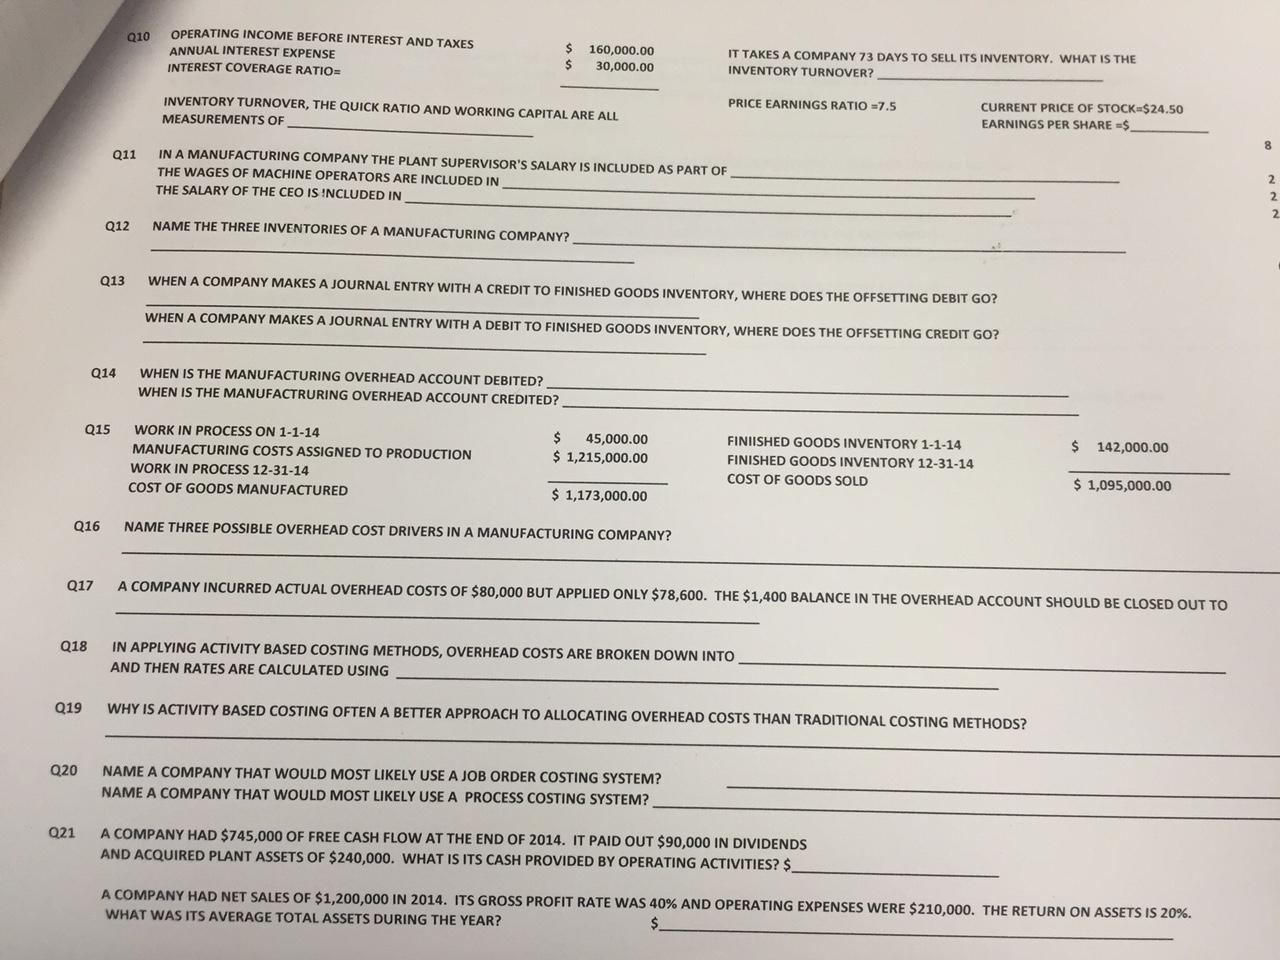 worksheet Eic Worksheet A 2014 all grade worksheets 2014 eic worksheet accounting archive june 16 2015 chegg